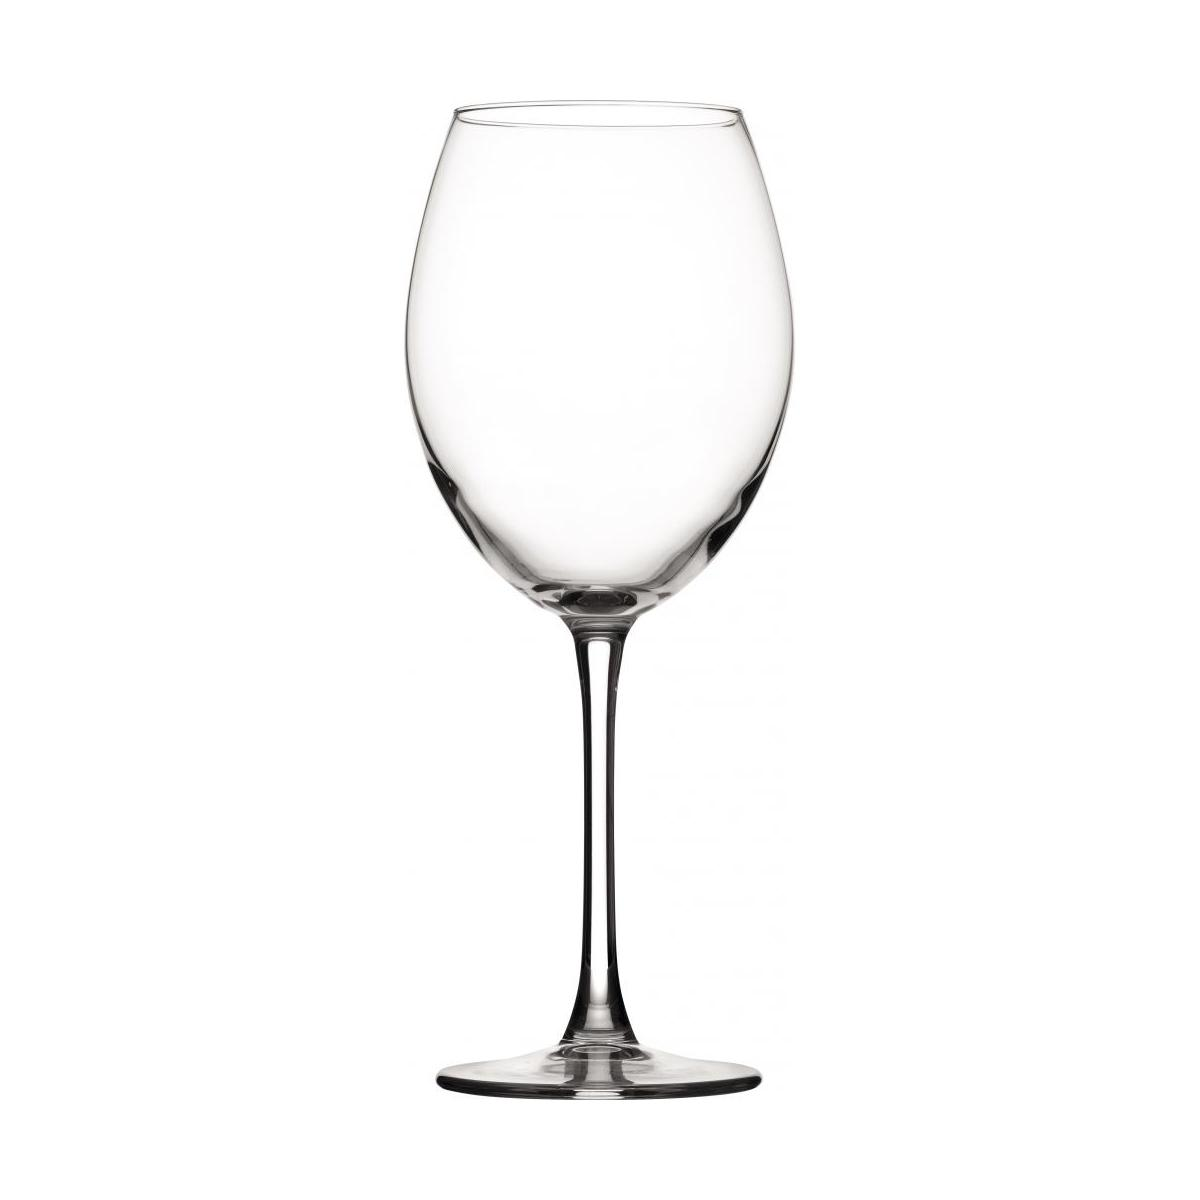 Utopia 39 Enoteca 39 Wine Glass 55cl 19oz Noble Express